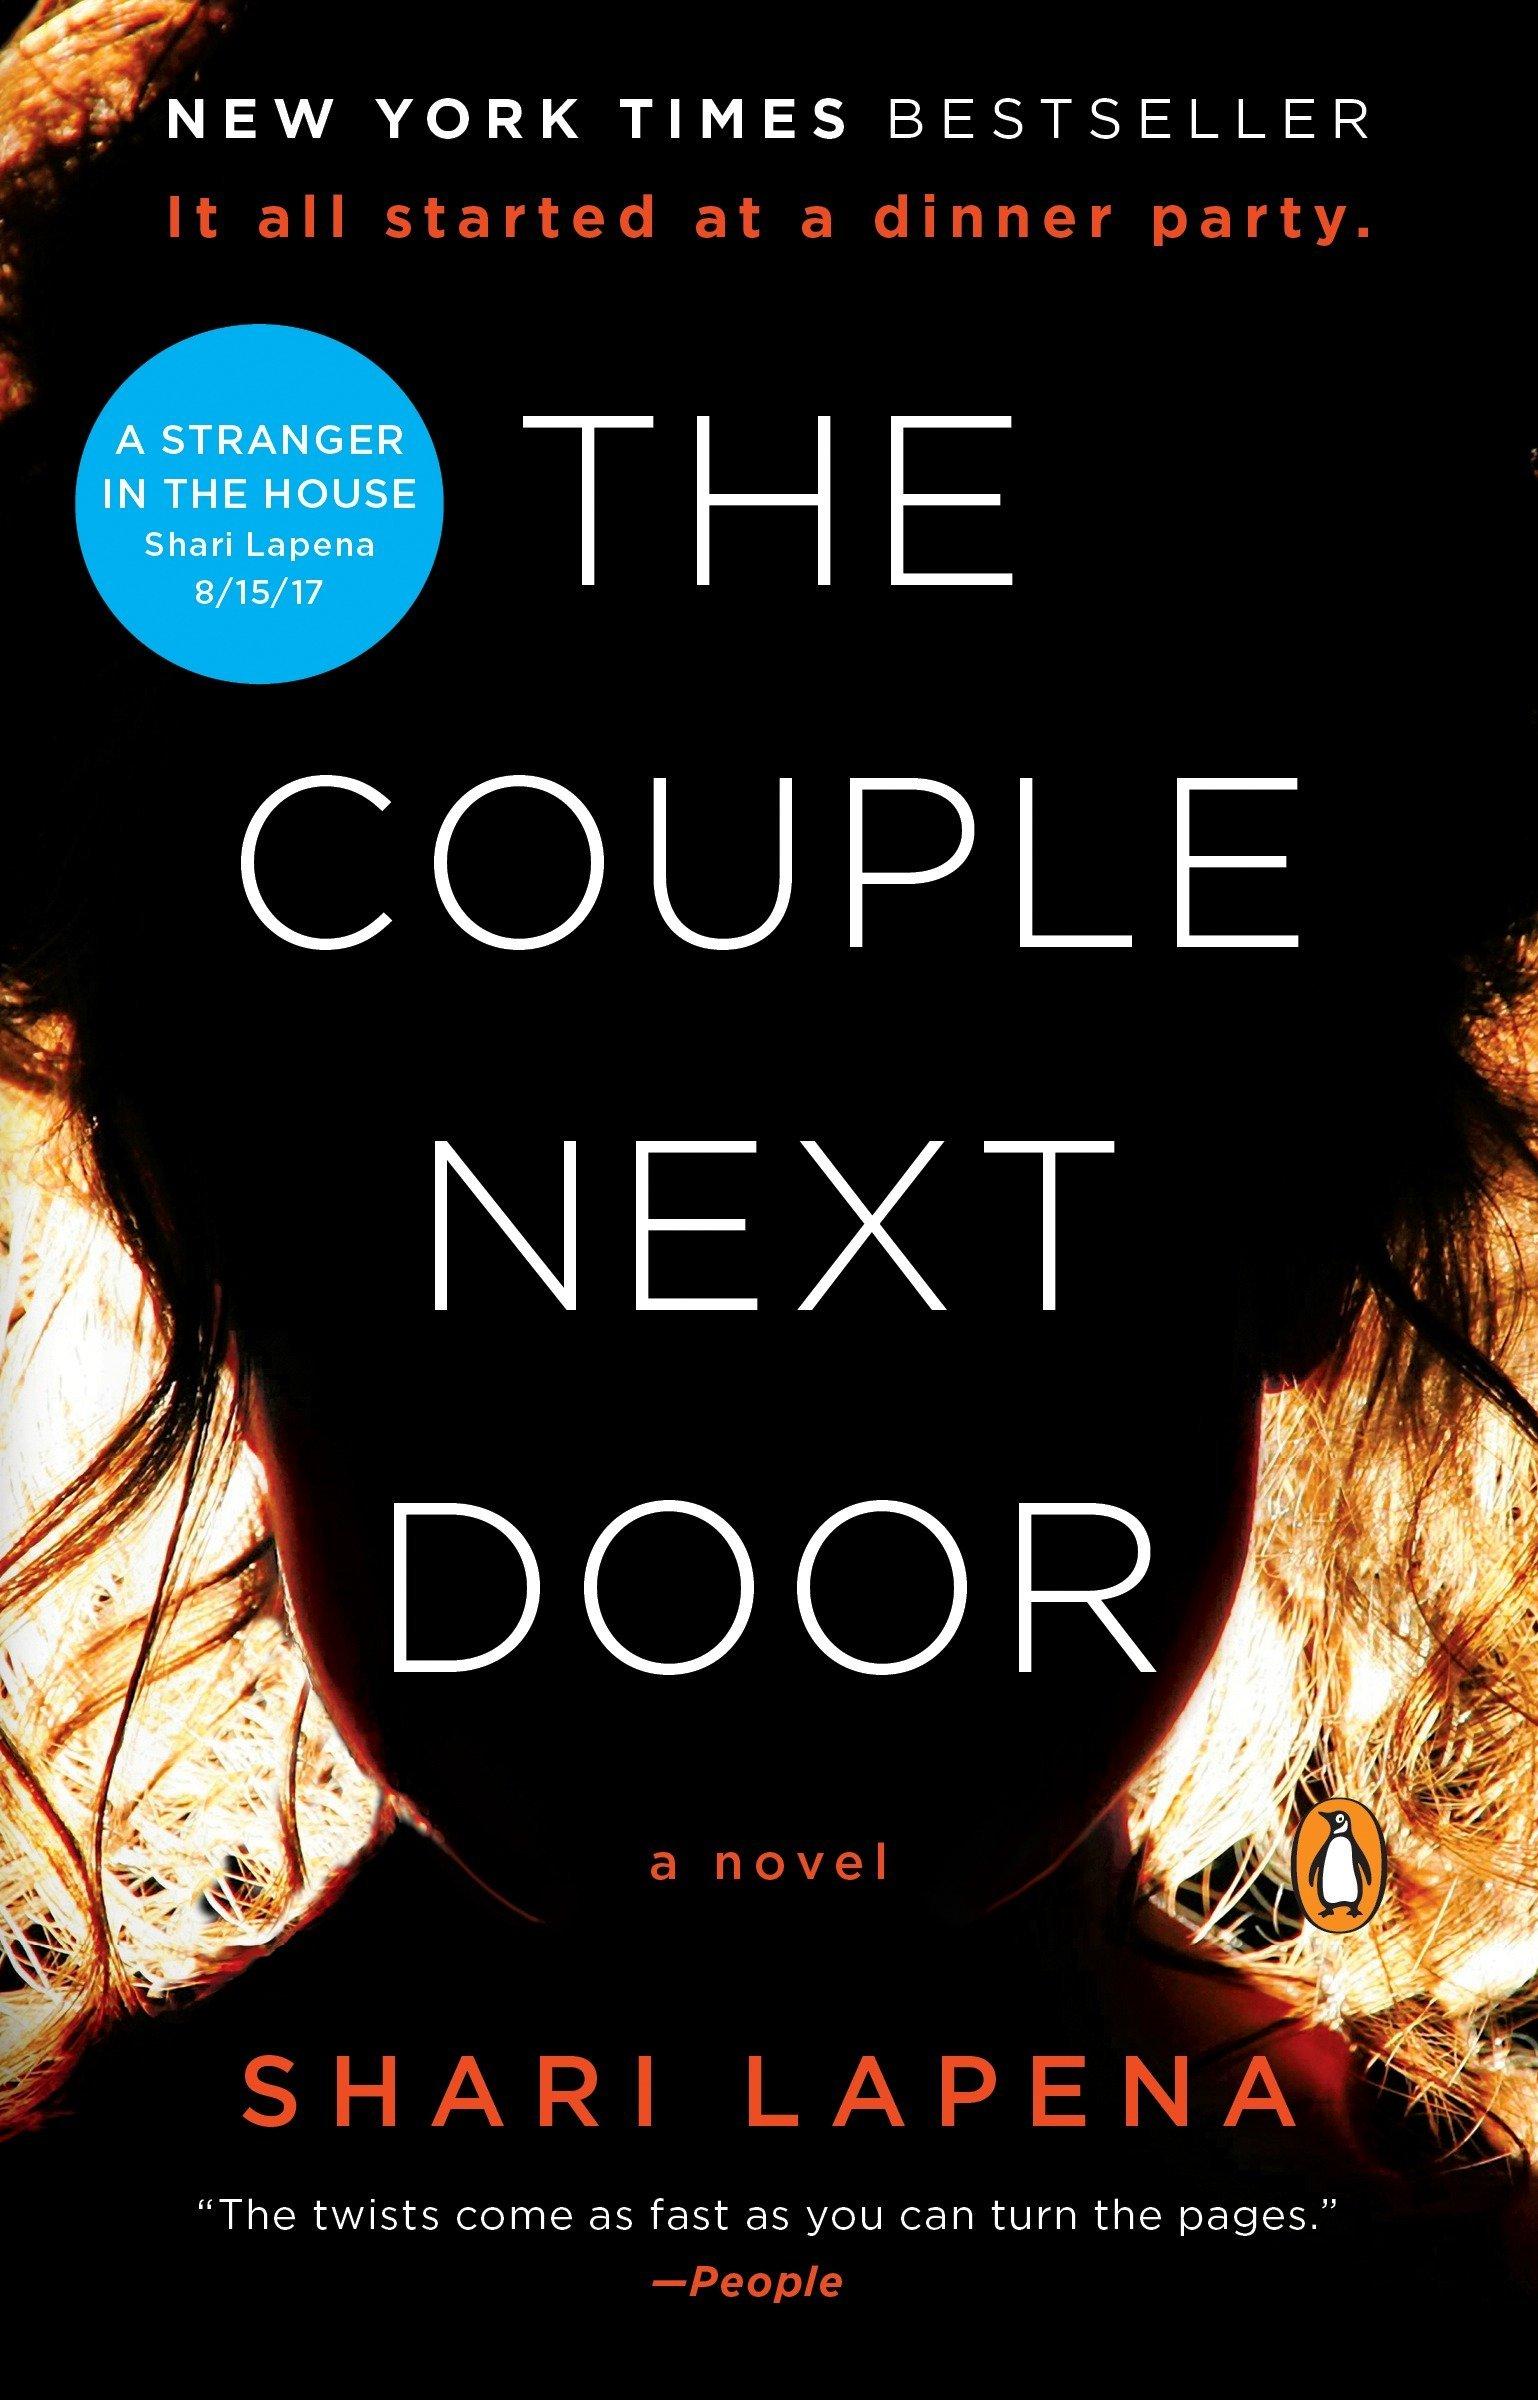 The Couple Next Door: A Novel